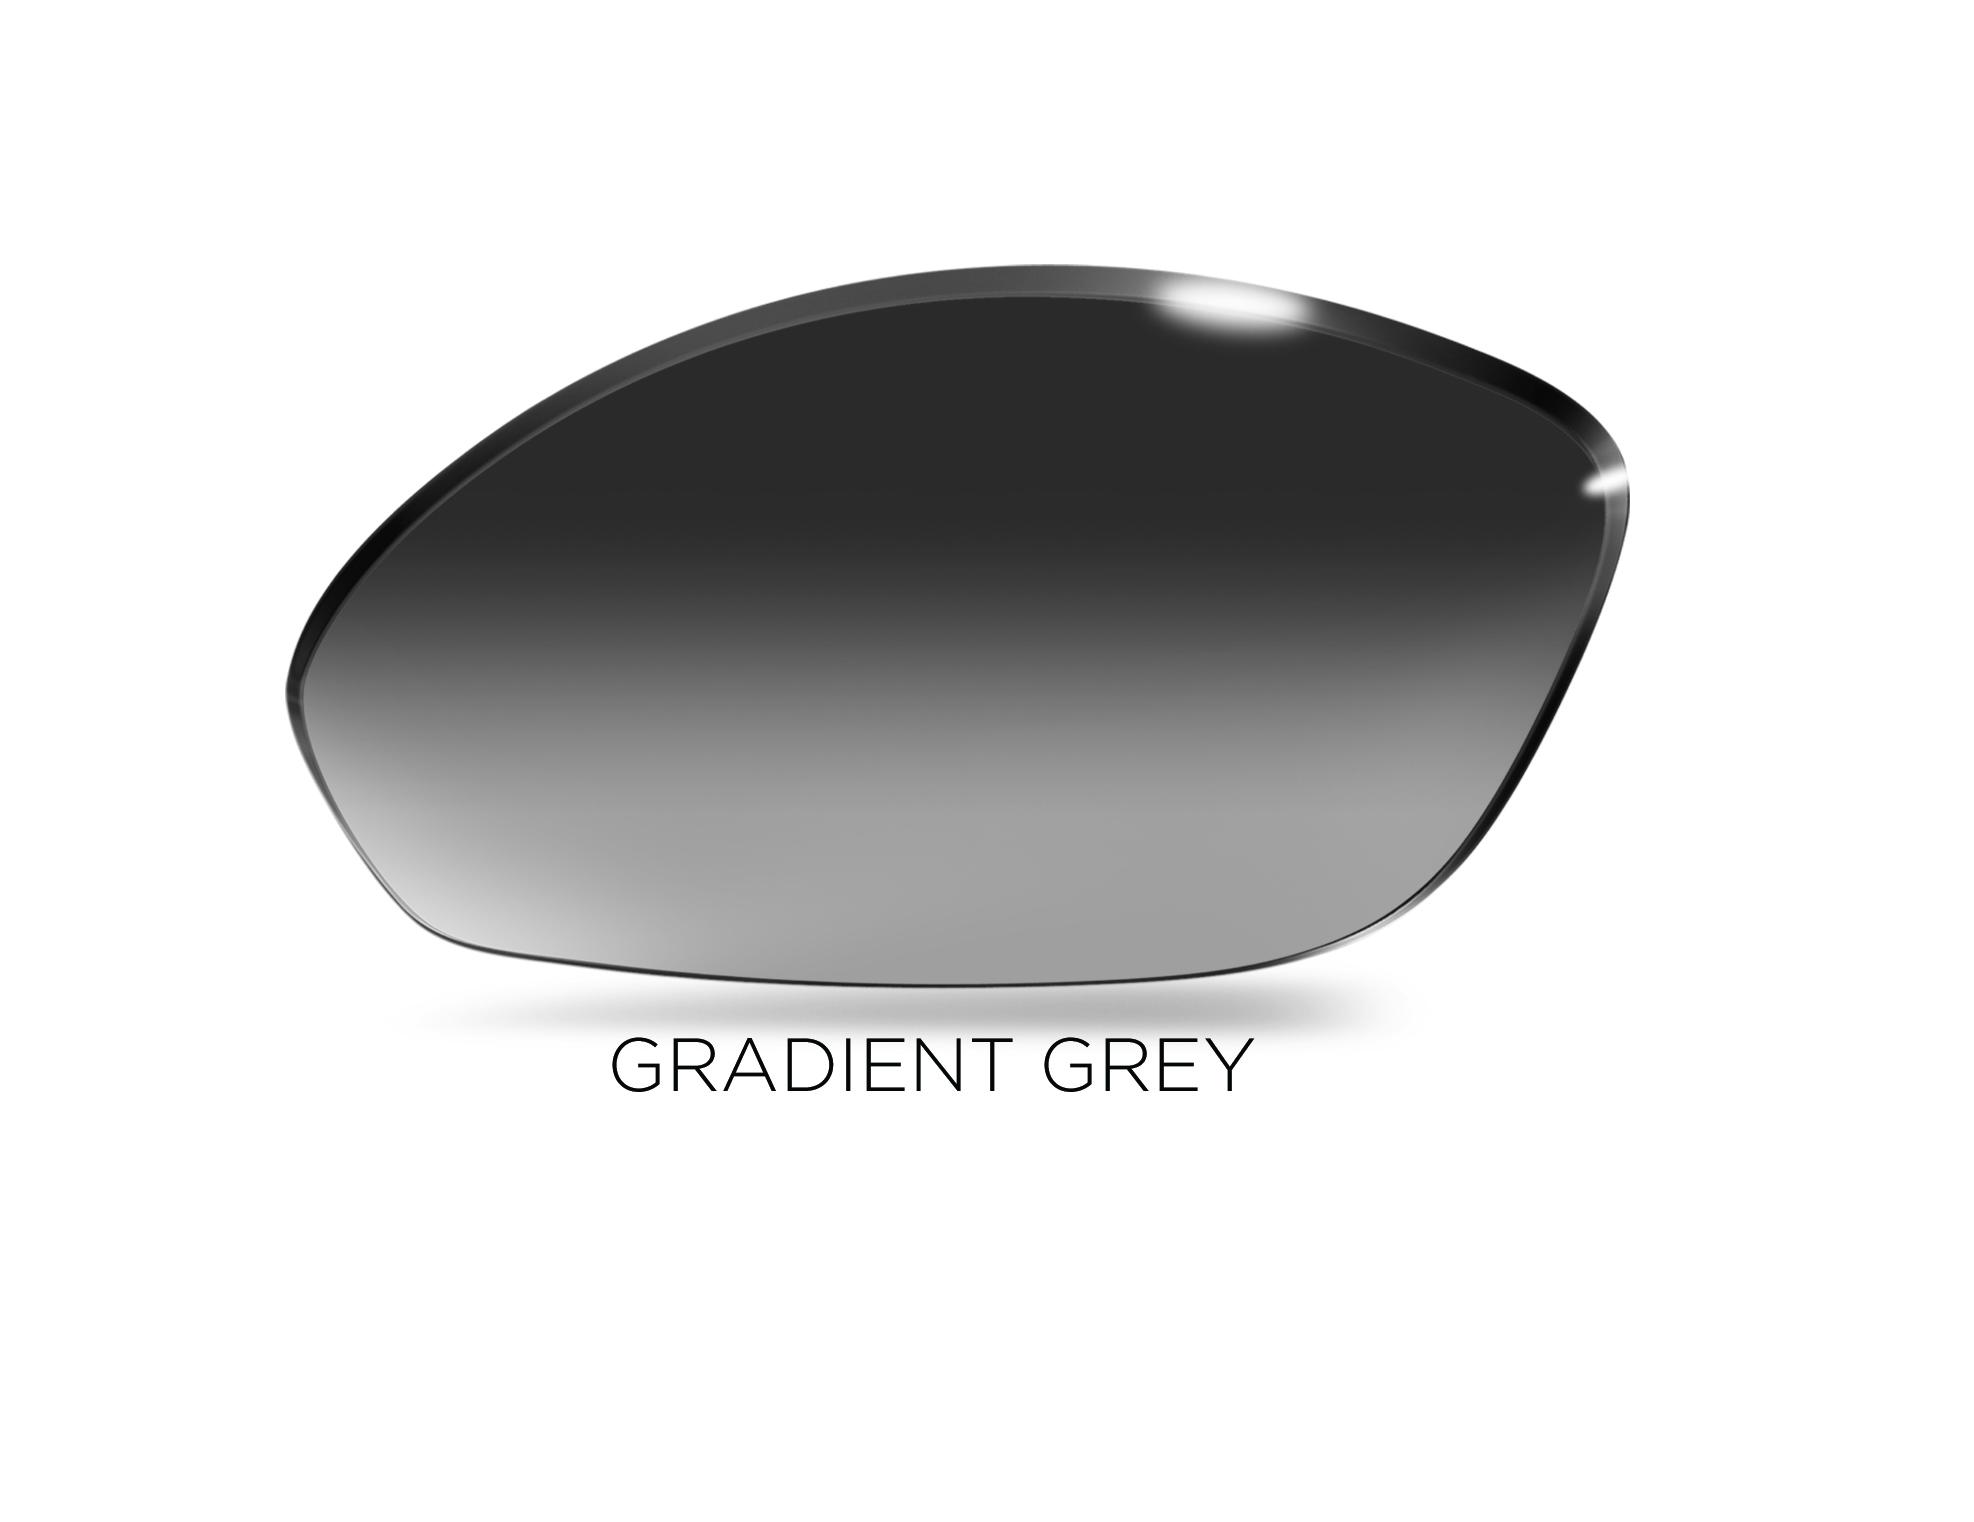 GRADIENT GRAY_lens